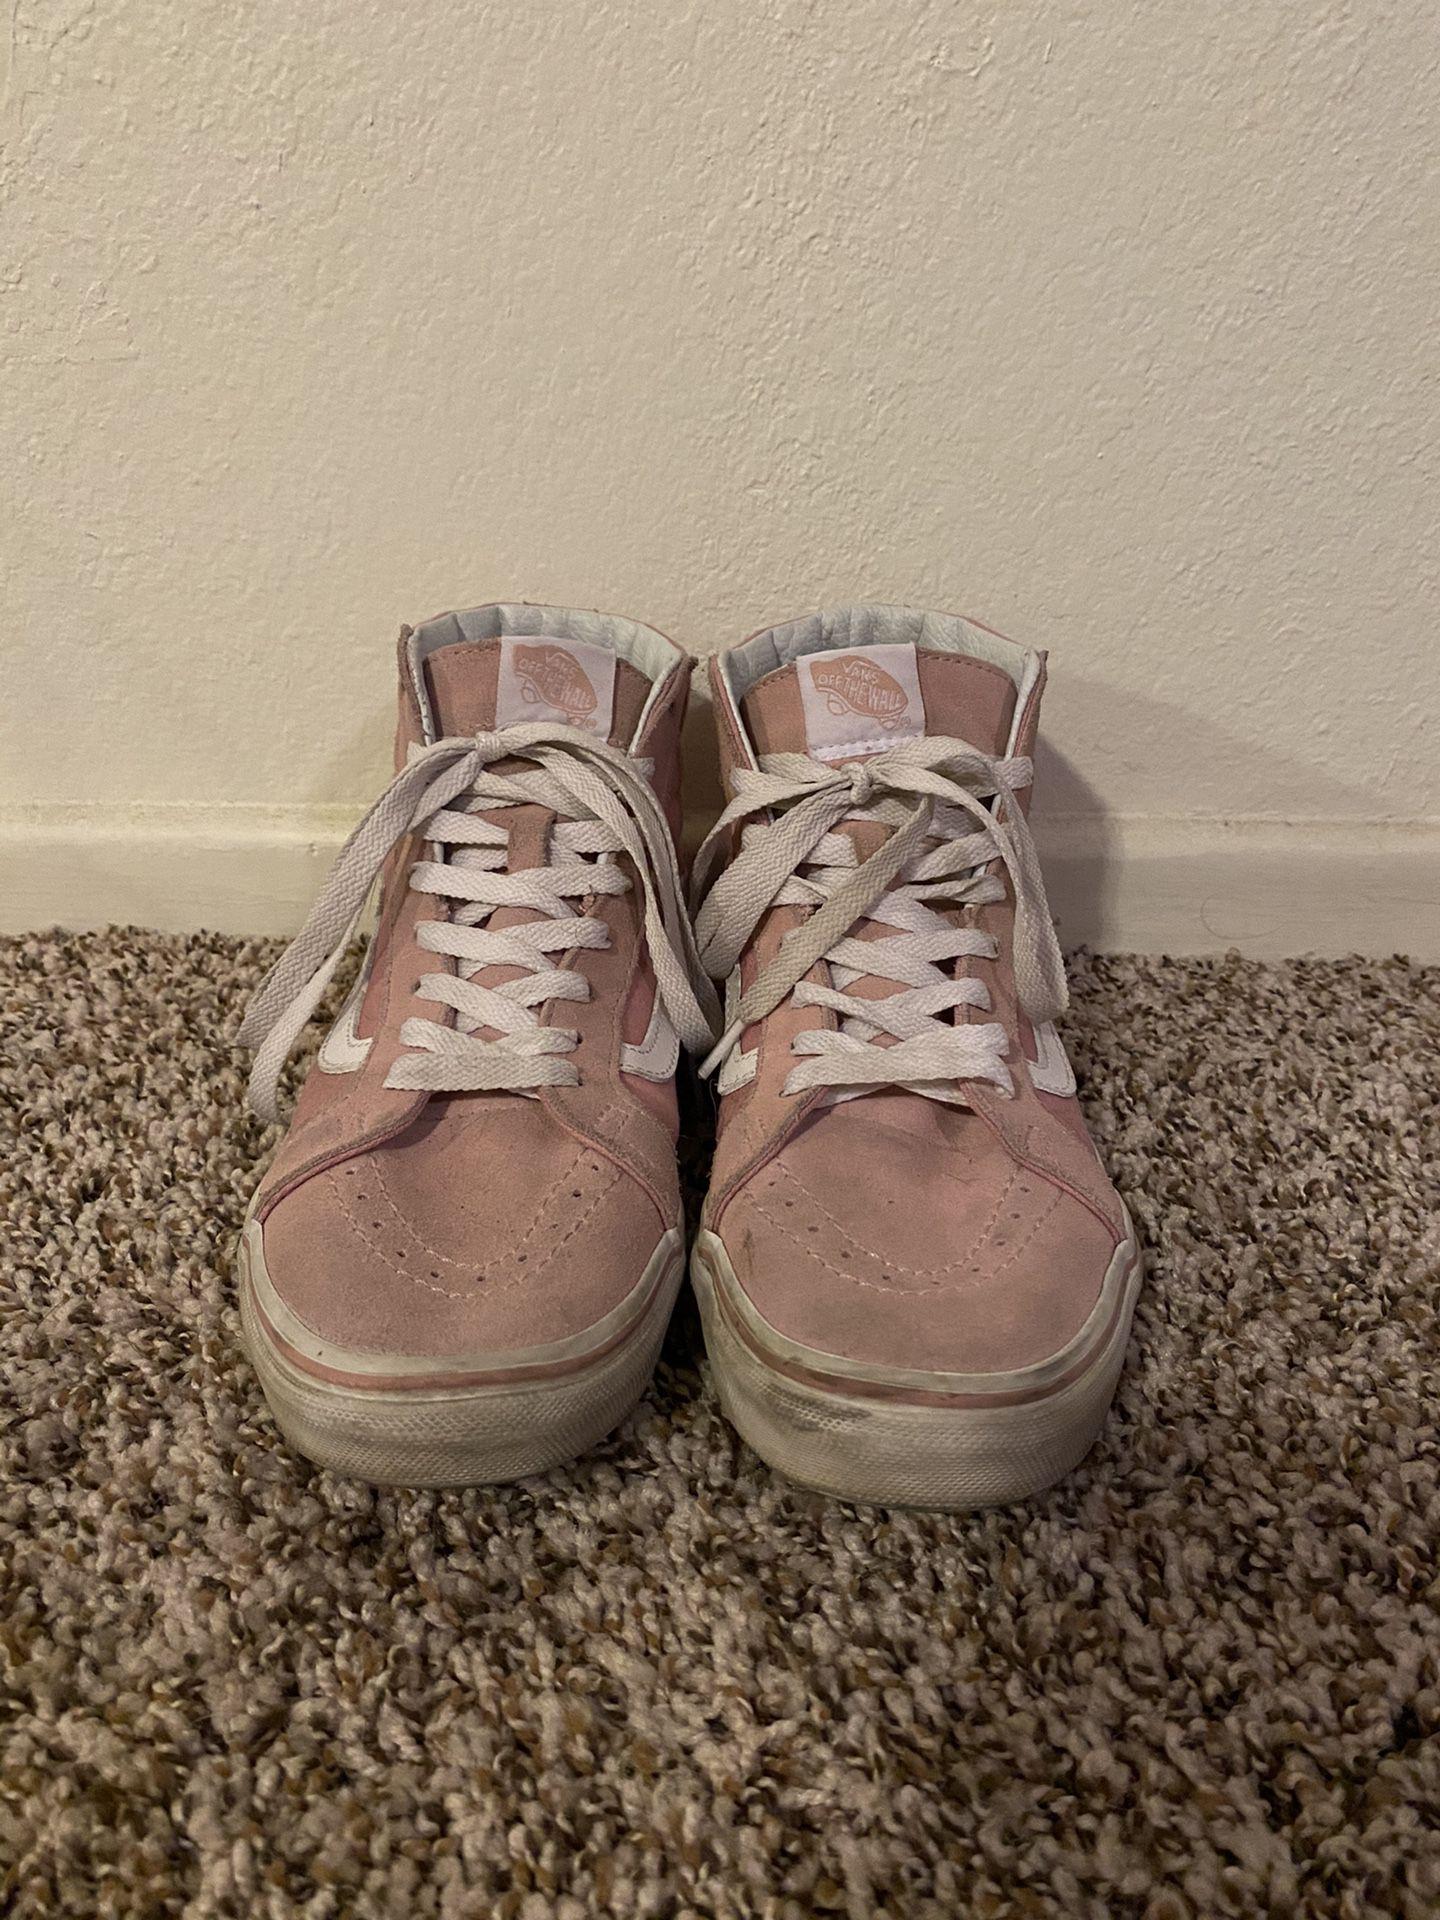 Pink vans high top shoes size men's 7.5